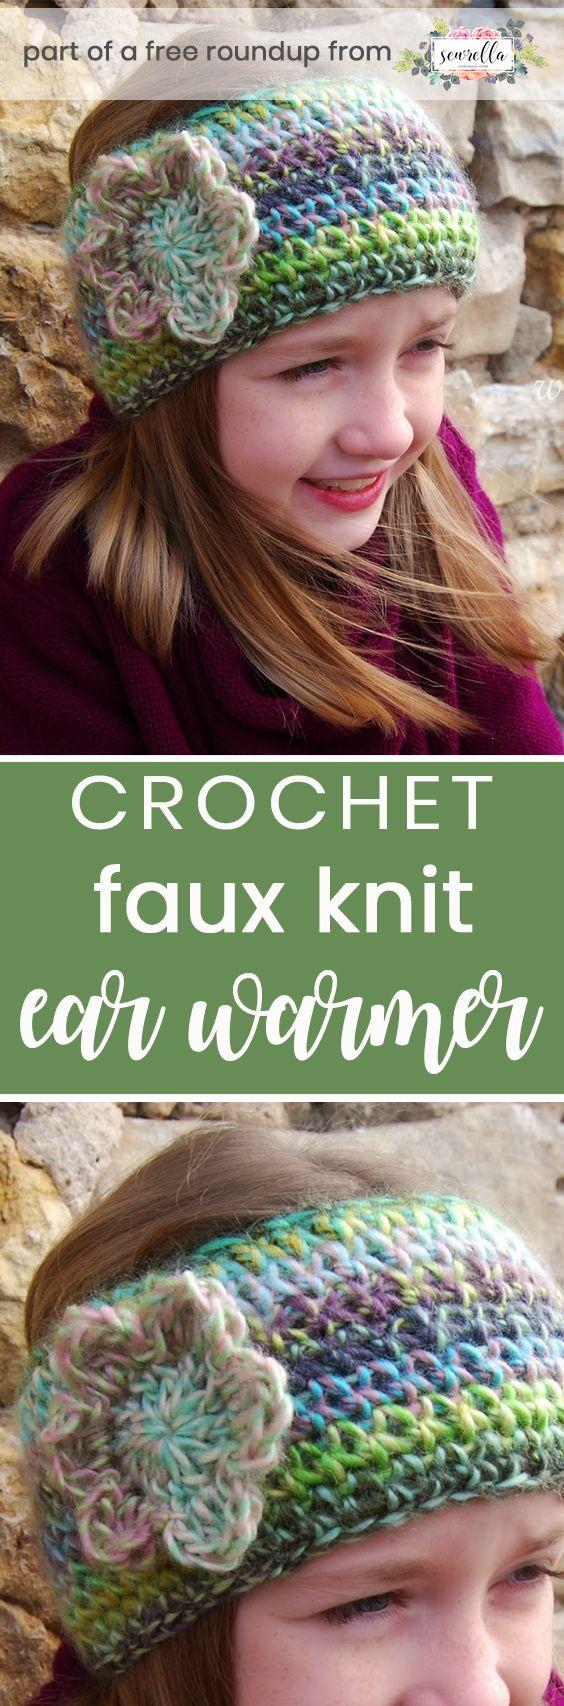 Crochet Gifts to make in Under 1 Hour   Ear warmer headband, Free ...